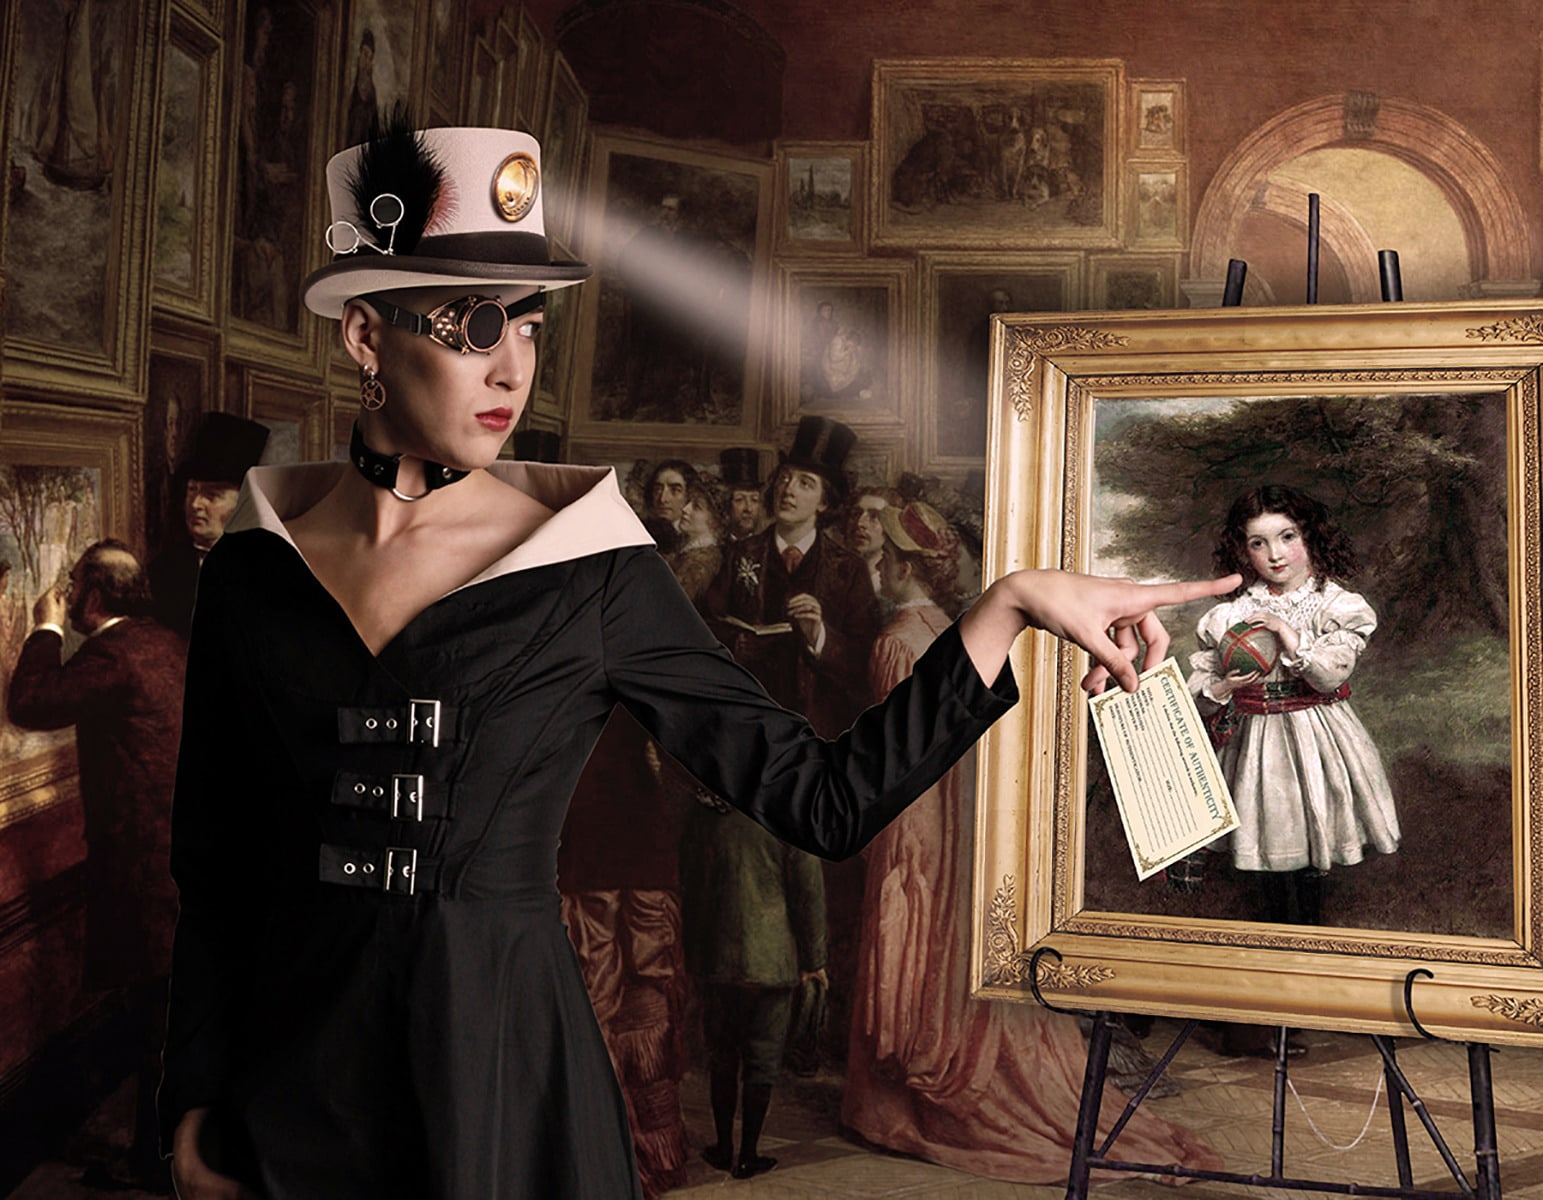 <div class='title'>           The Art Authenticator by Linda Lewis         </div>                 <div class='description'>           If You Love This... View Linda's Portfolio for More!.         </div>